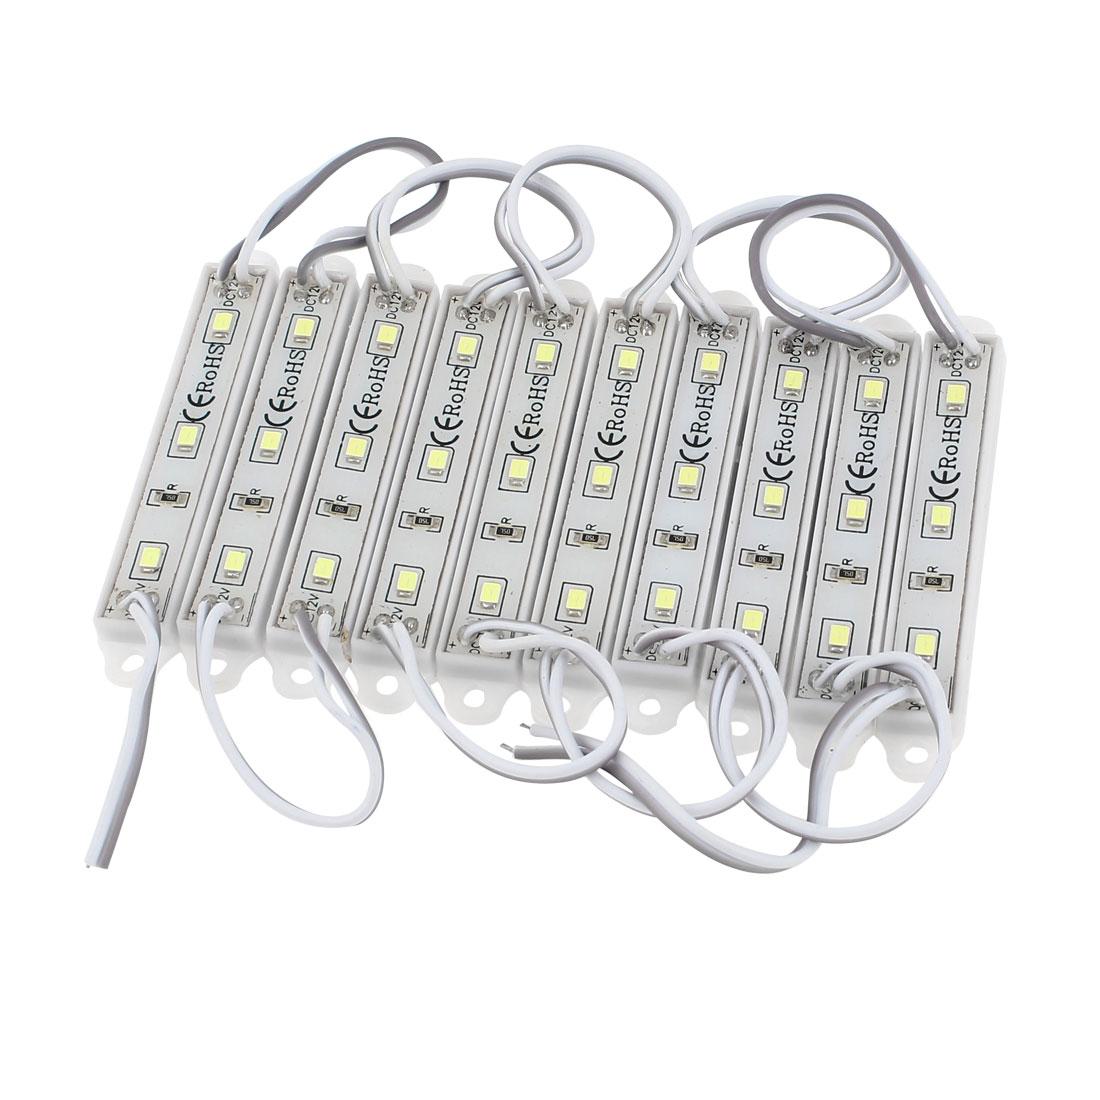 Waterproof White 2835 SMD 30 LED Module Light Lamp Strip Decration